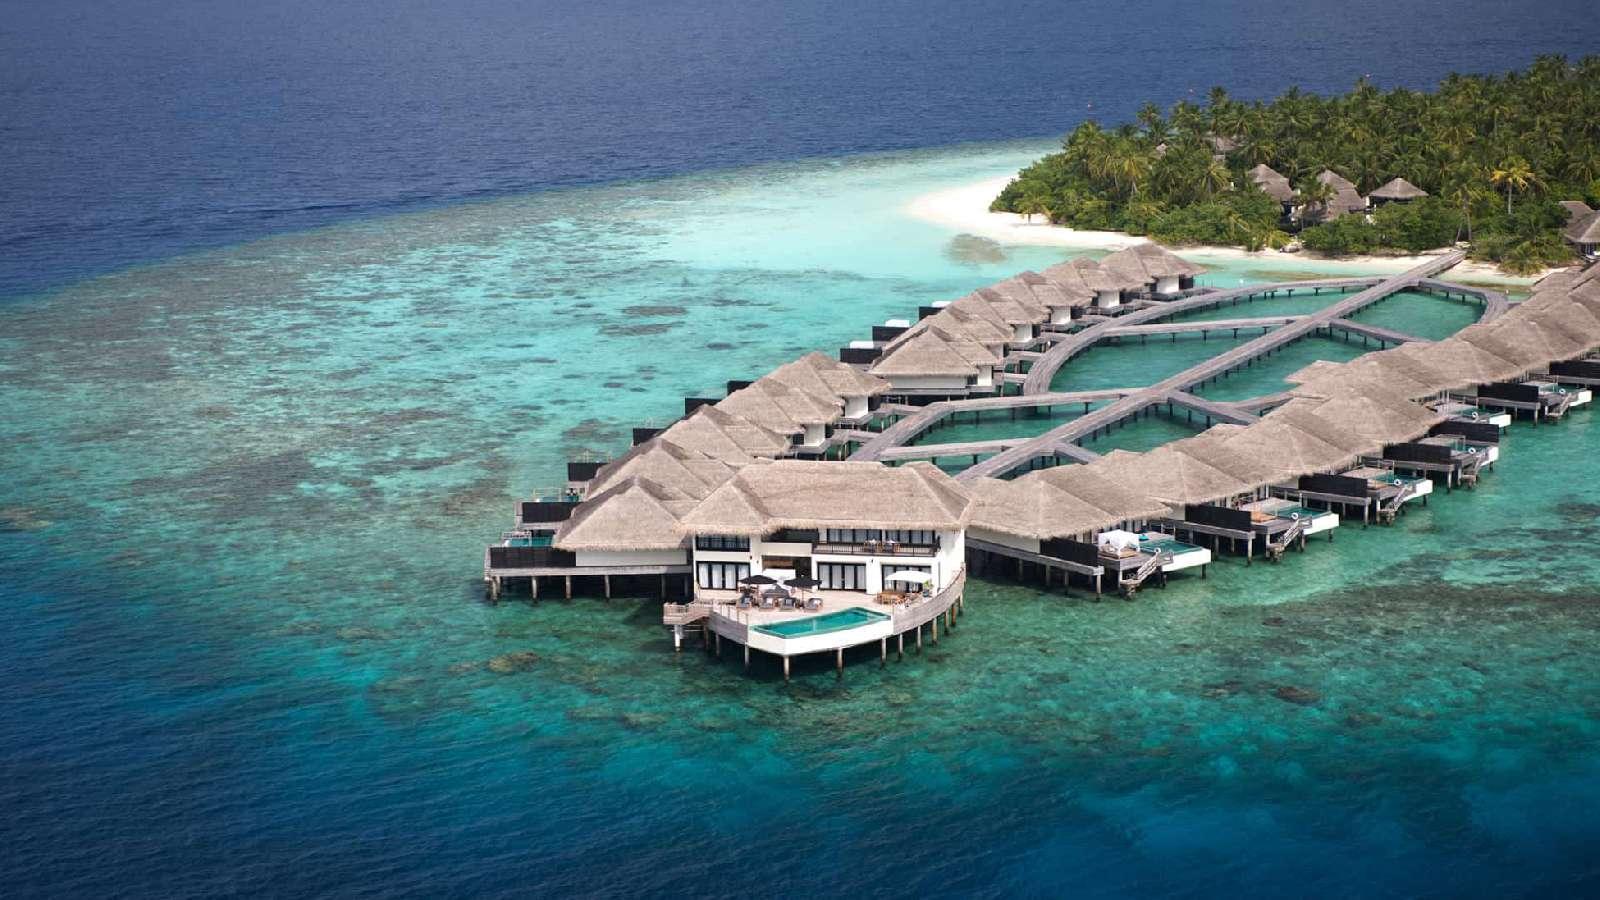 Outtrigger Konotta - Hotels & resort - Maldive   Albatros ...